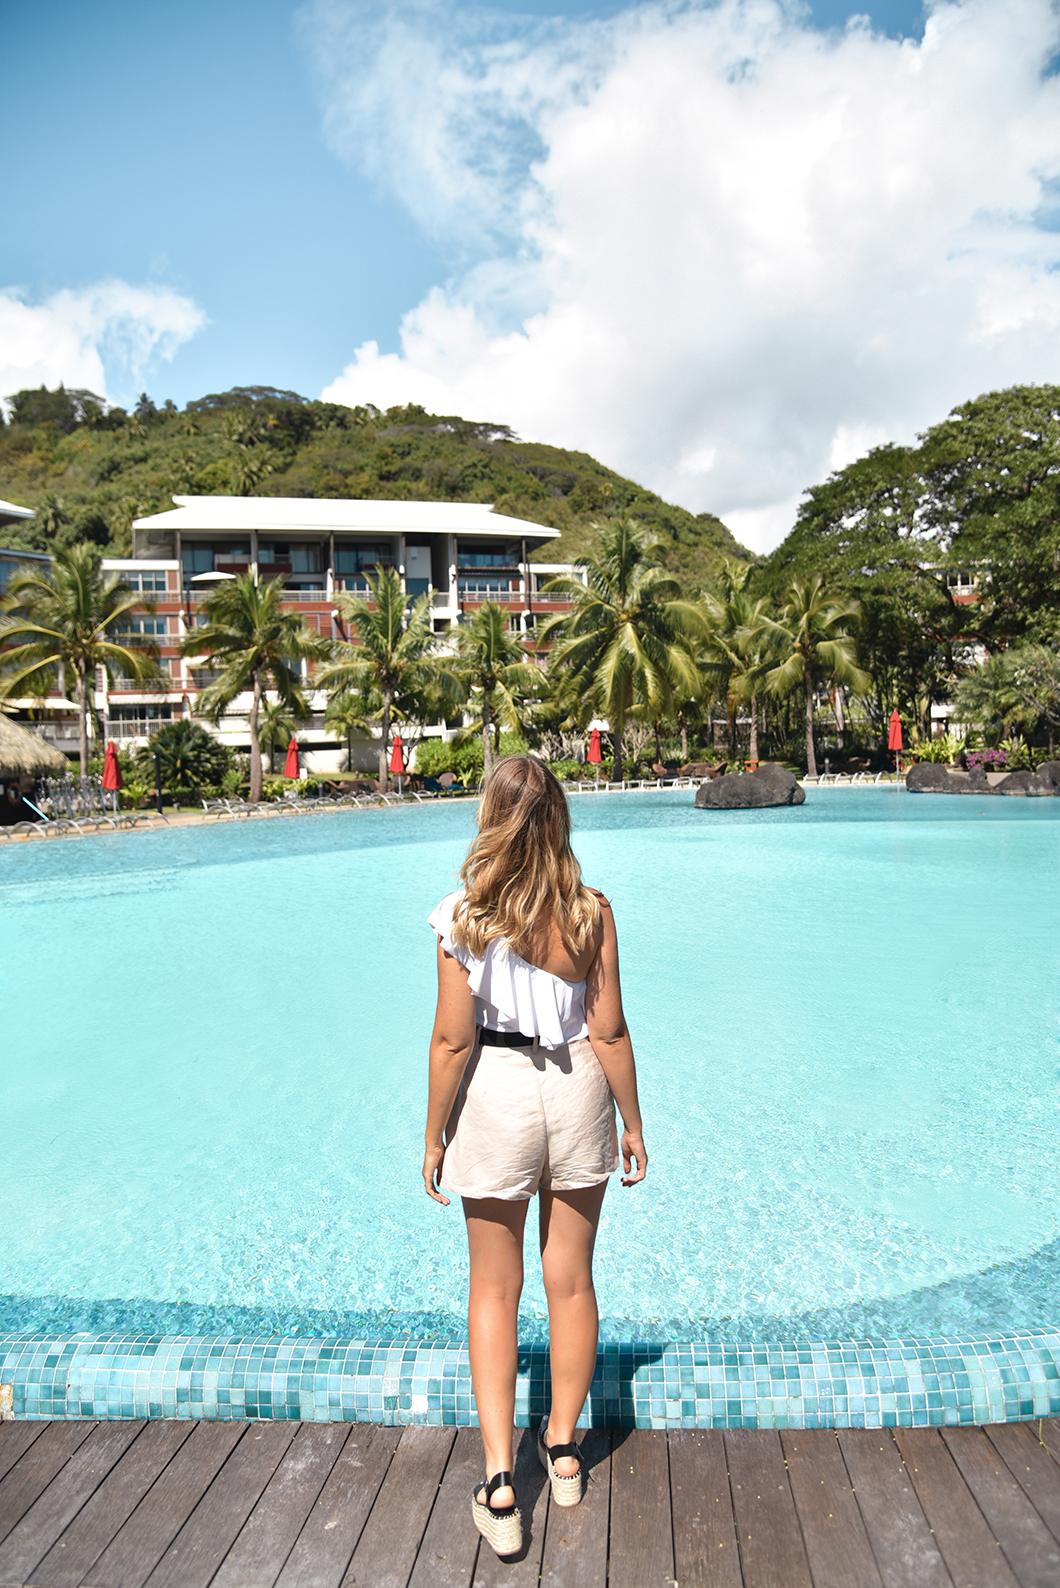 Où dormir à Tahiti ? Le Tahiti Pearl Beach